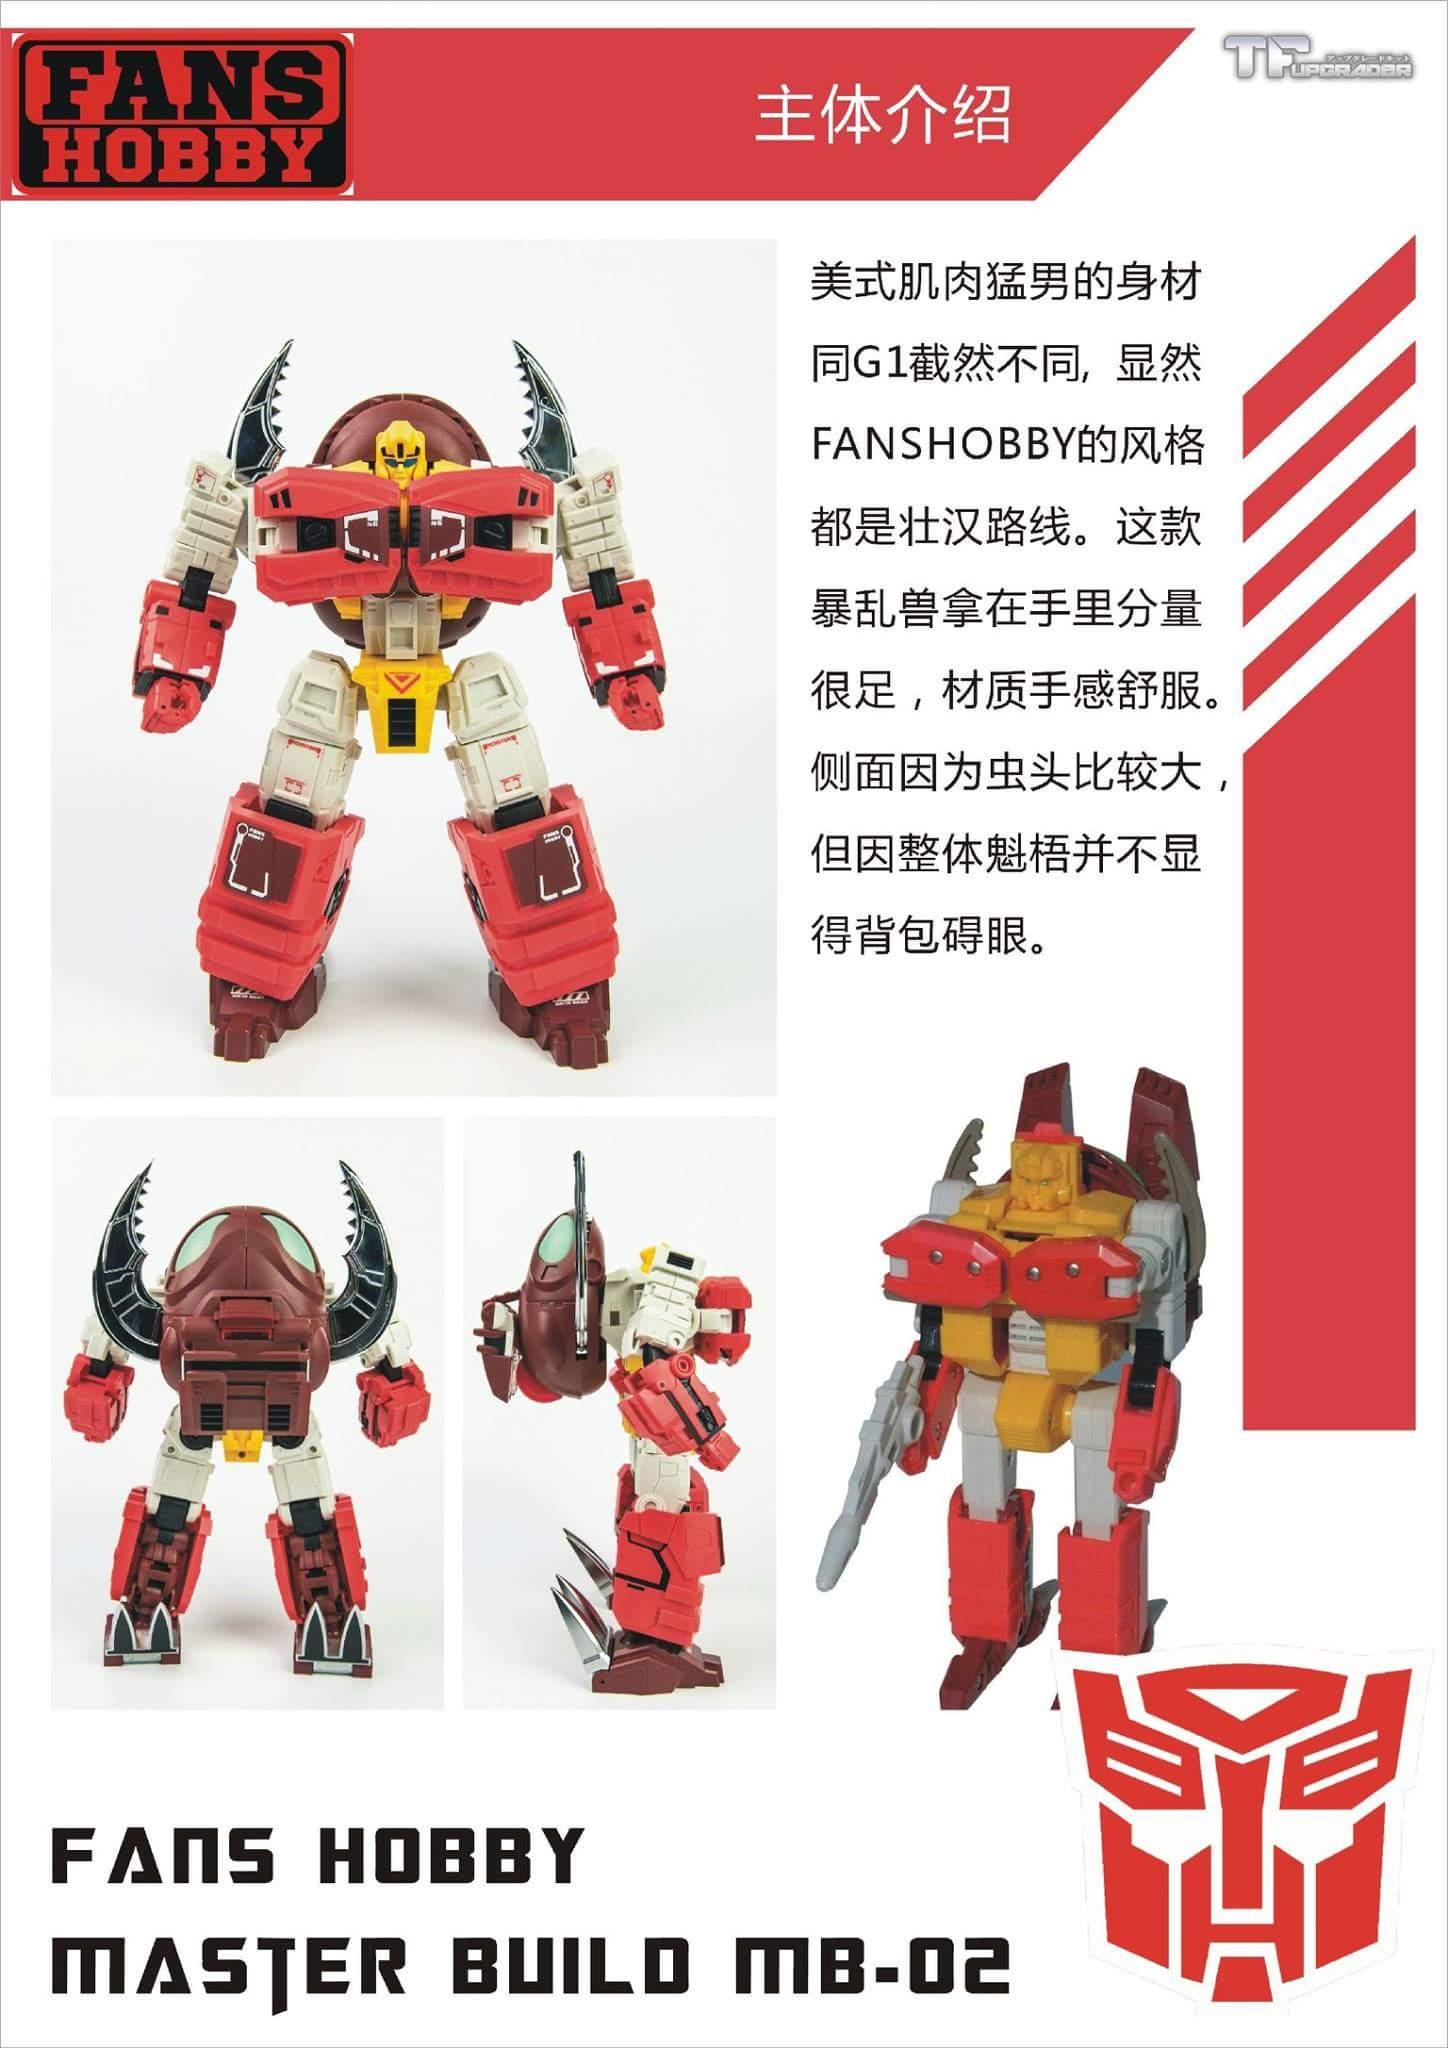 [FansHobby] Produit Tiers - Master Builder MB-02/03/05 - aka Monsterbots/Monstrebots VnidGh87